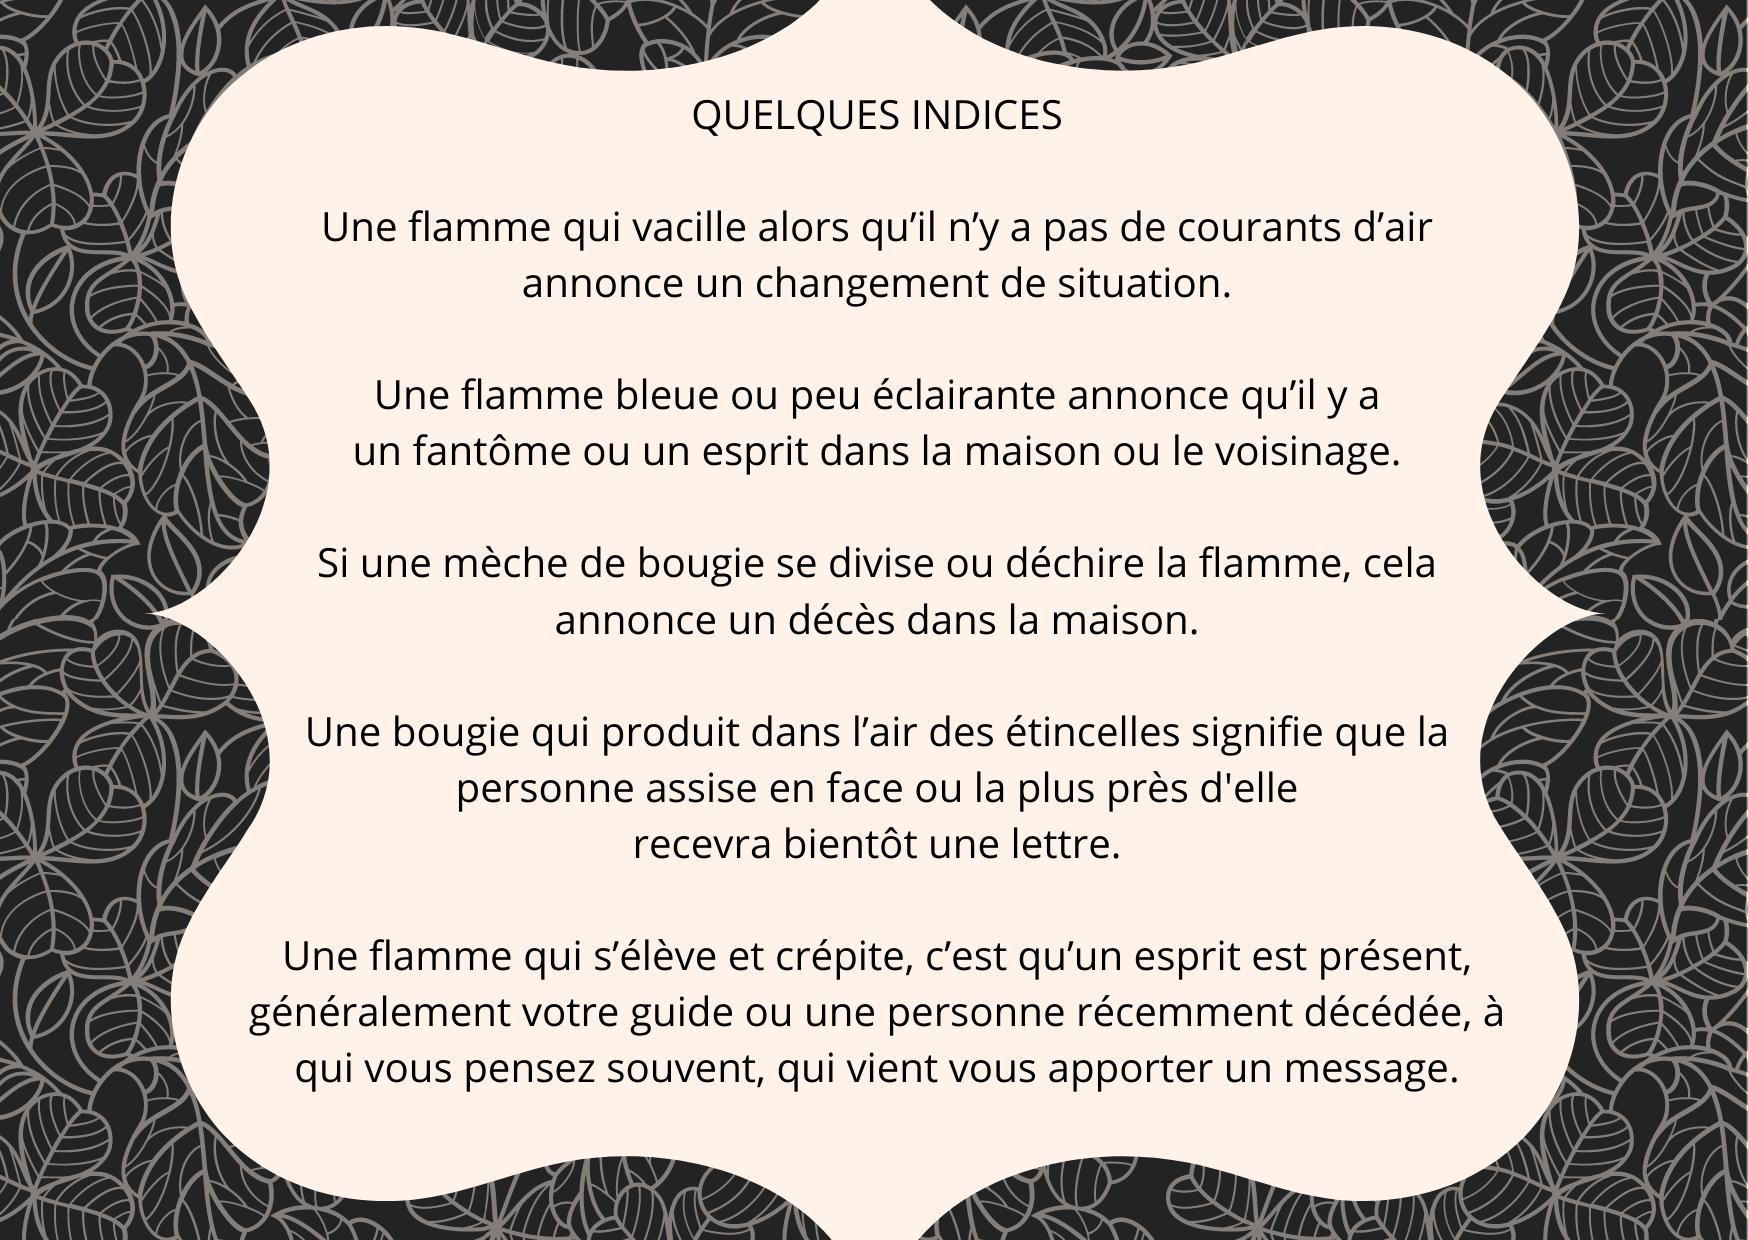 Bougie1